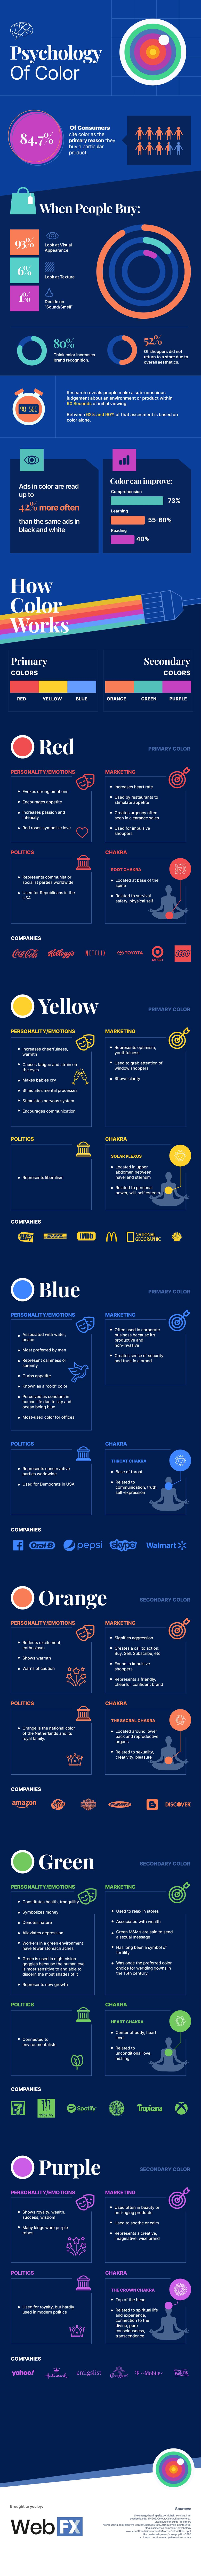 Psychology Of Color Infographic Web Design Infographic Web Design Psychology [ 12834 x 1000 Pixel ]